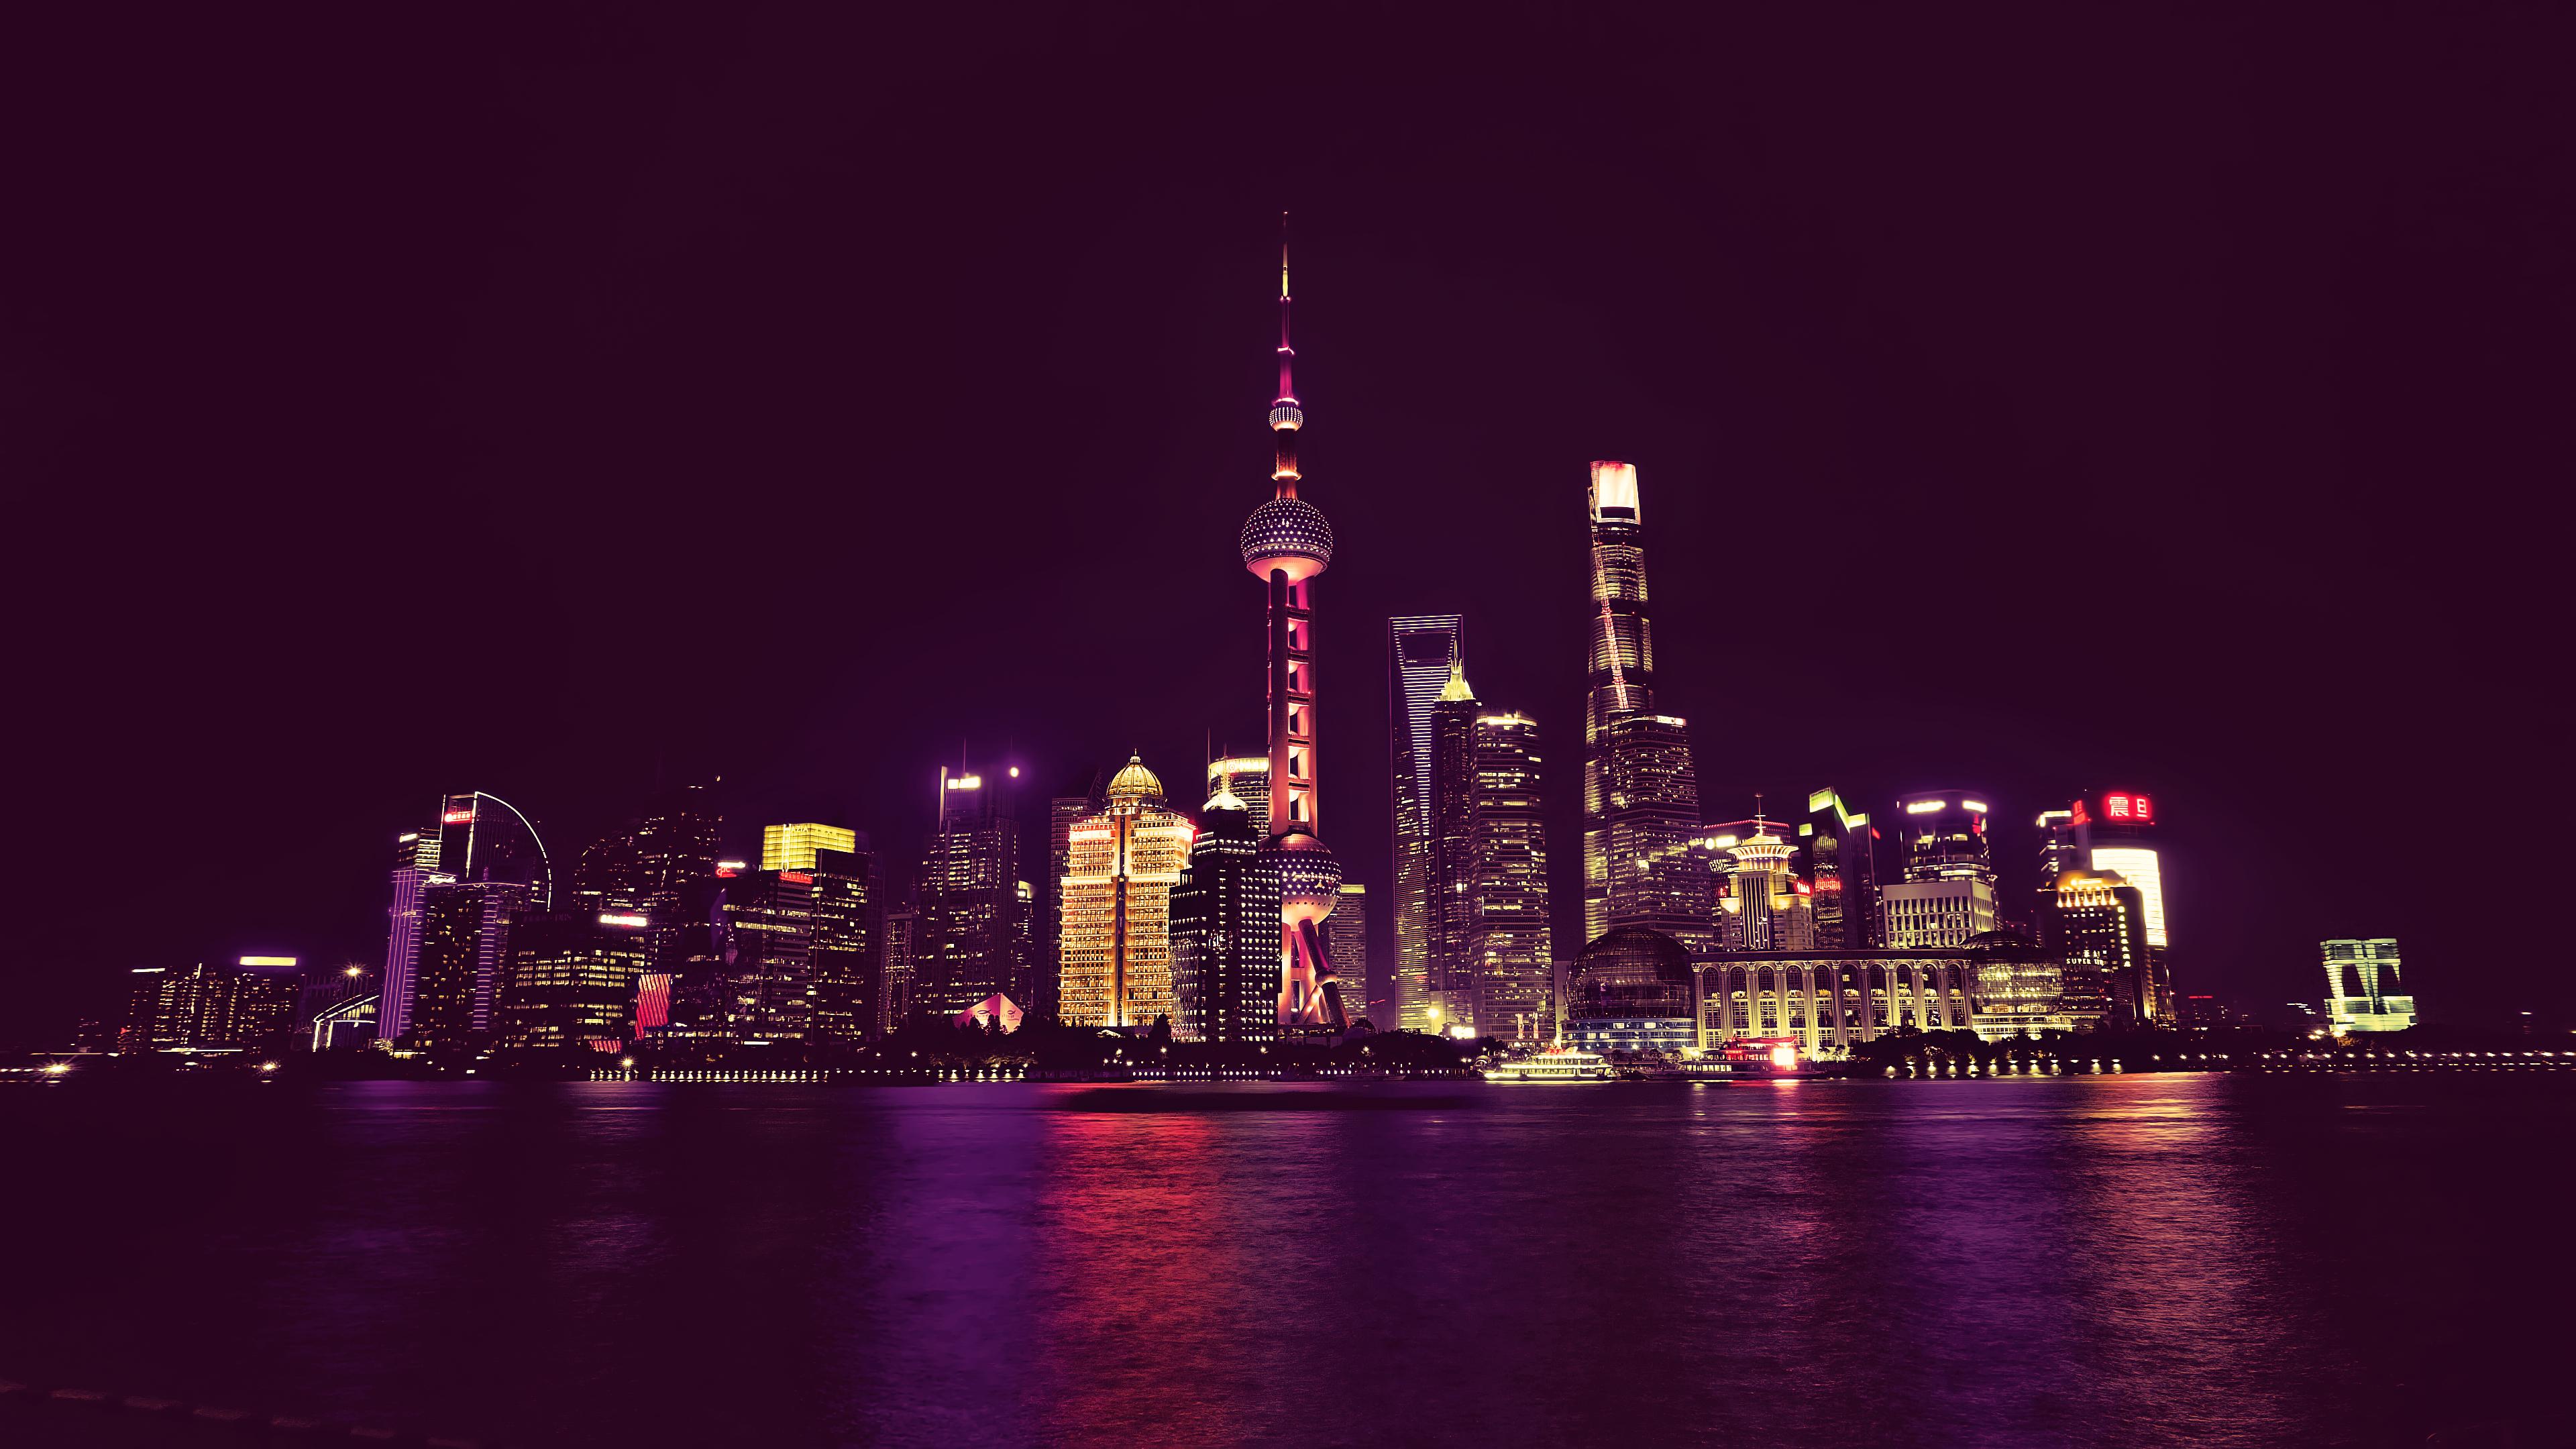 China Neon City Light Cityscape, HD 4K Wallpaper